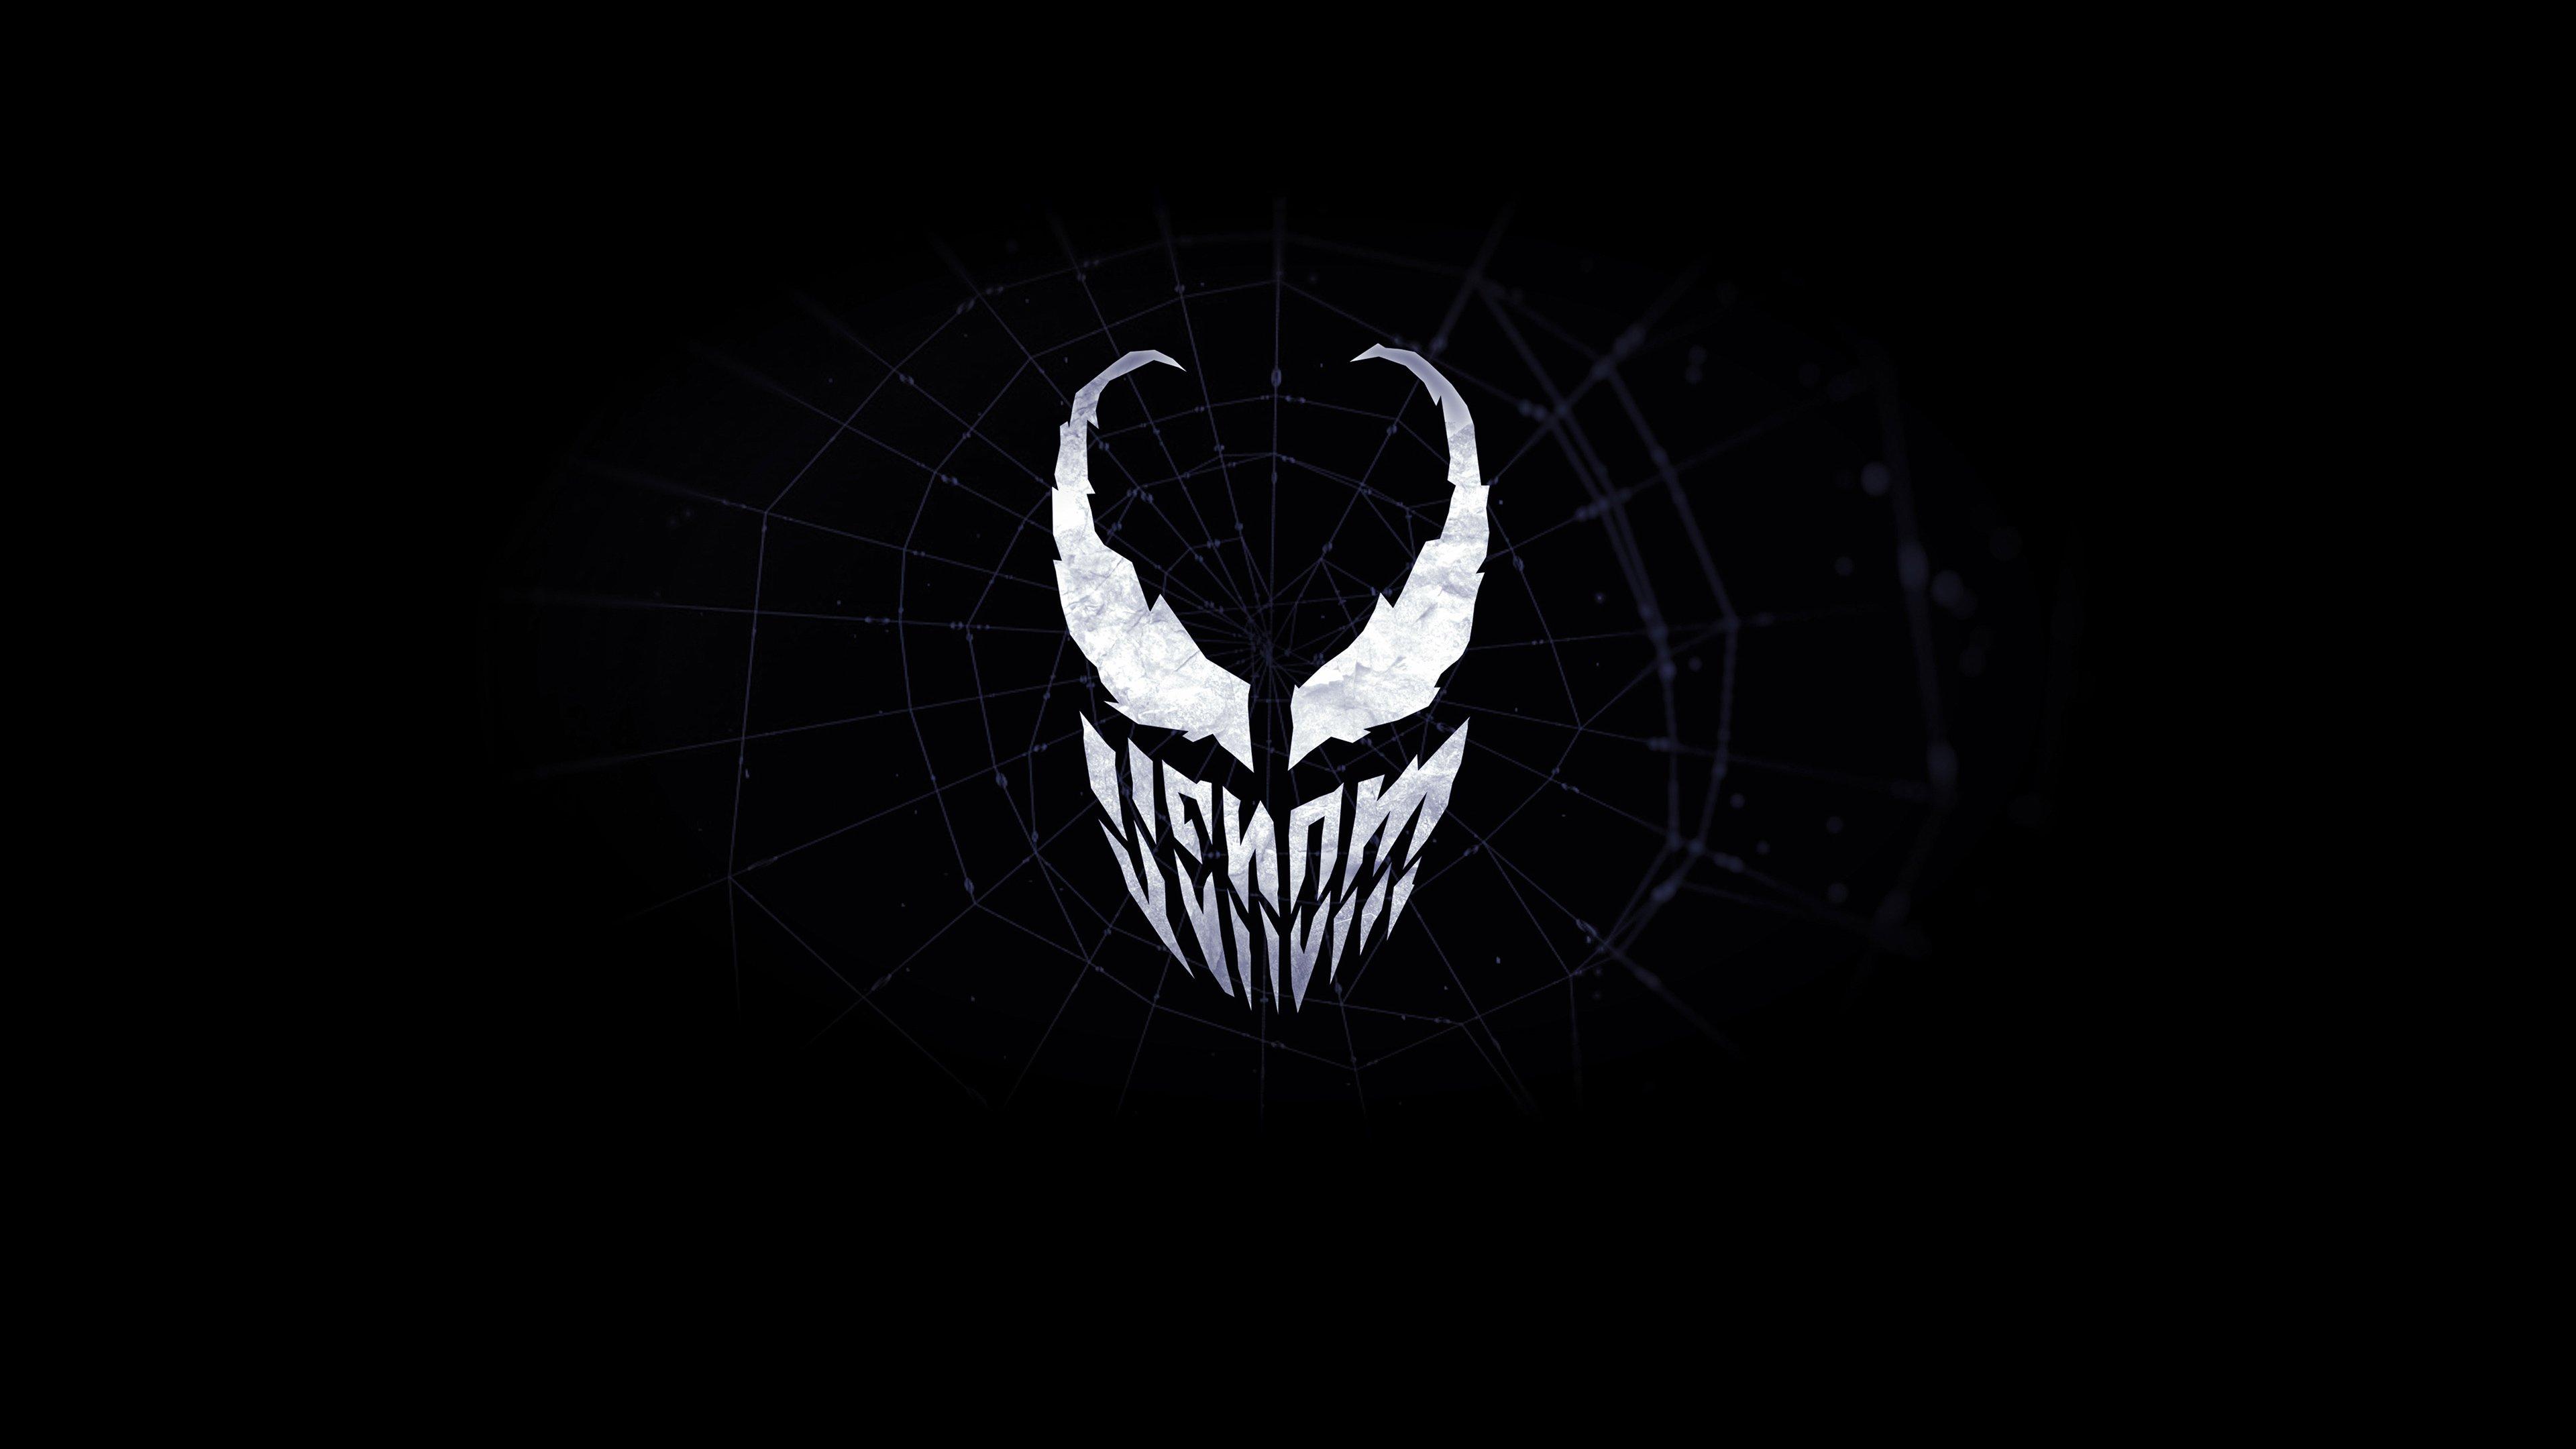 Wallpaper Venom Minimalist Logo